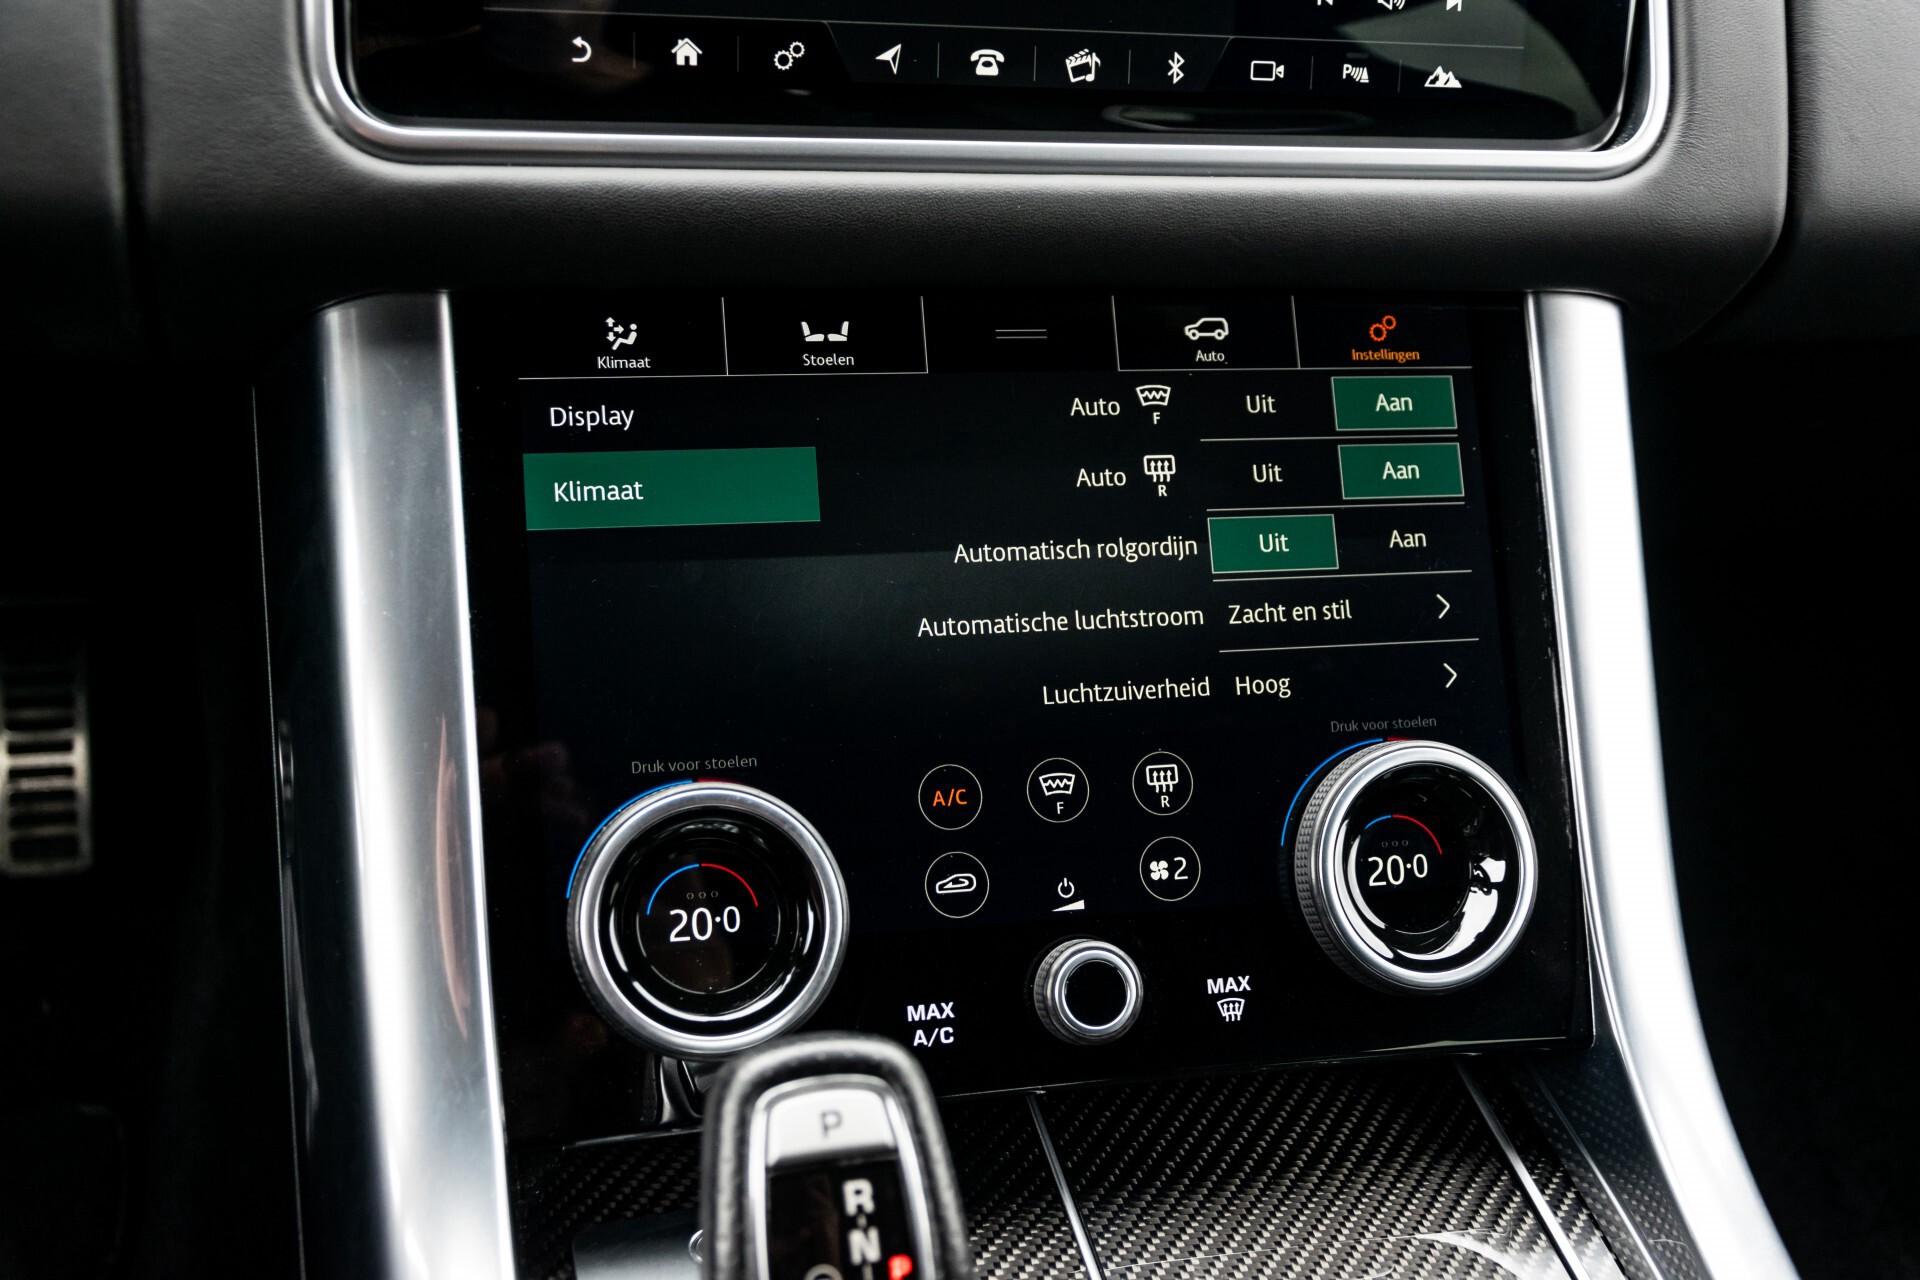 Land Rover Range Rover Sport SVR 5.0 Supercharged 575pk Full Carbon Nieuwprijs €241377 Foto 31